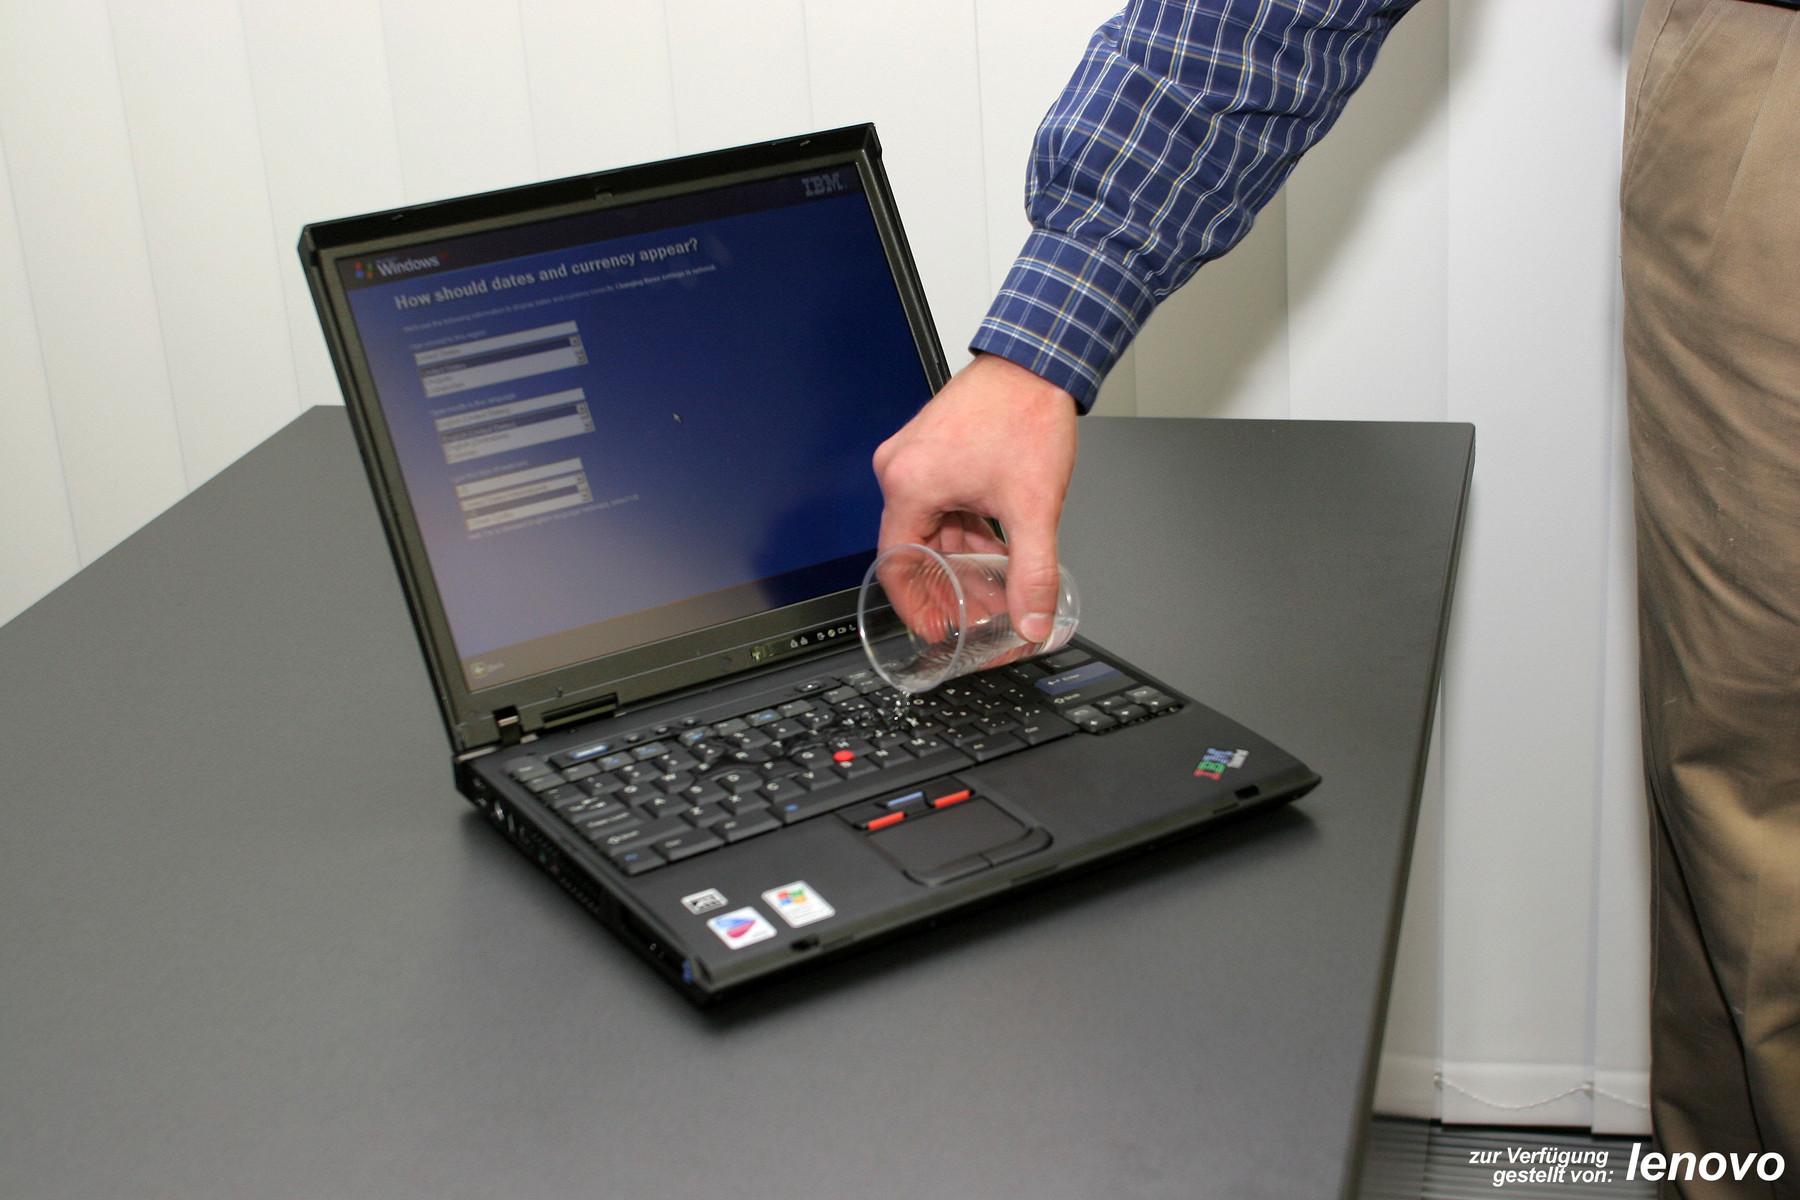 Review IBM/Lenovo Thinkpad T60 - NotebookCheck.net Reviews